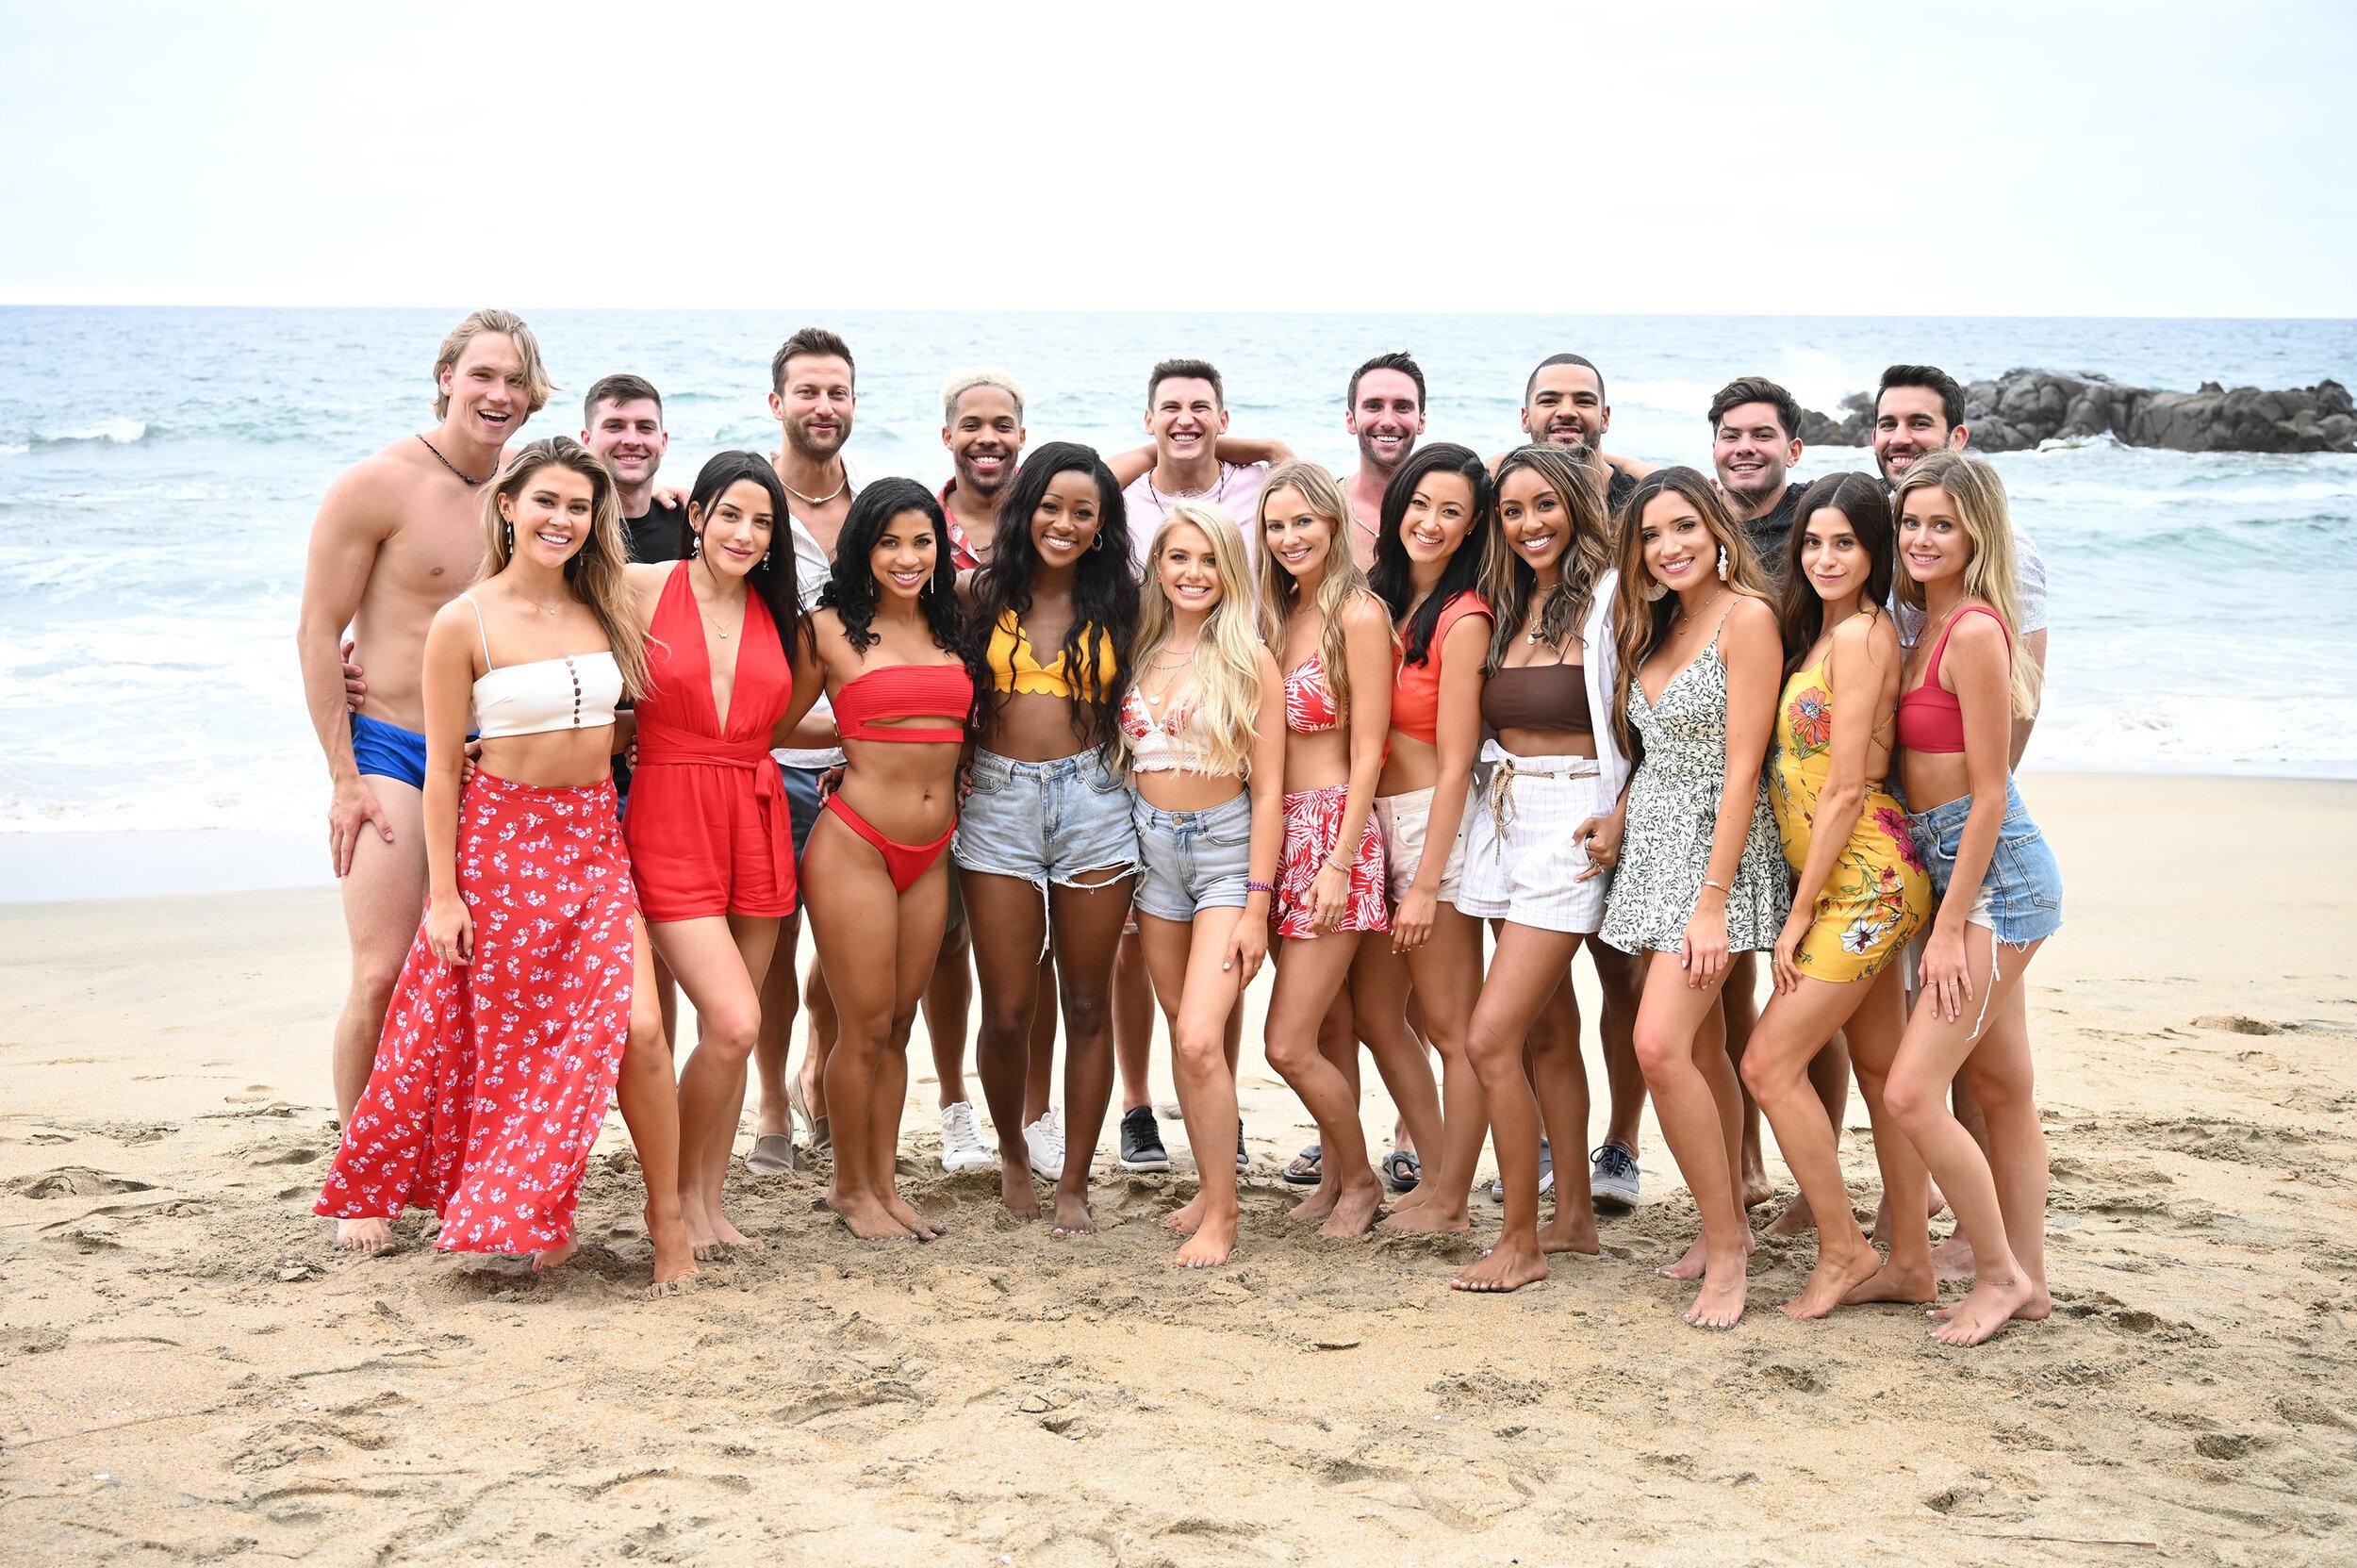 Jones (back row, far left) with the cast of Bachelor in Paradise Season 6